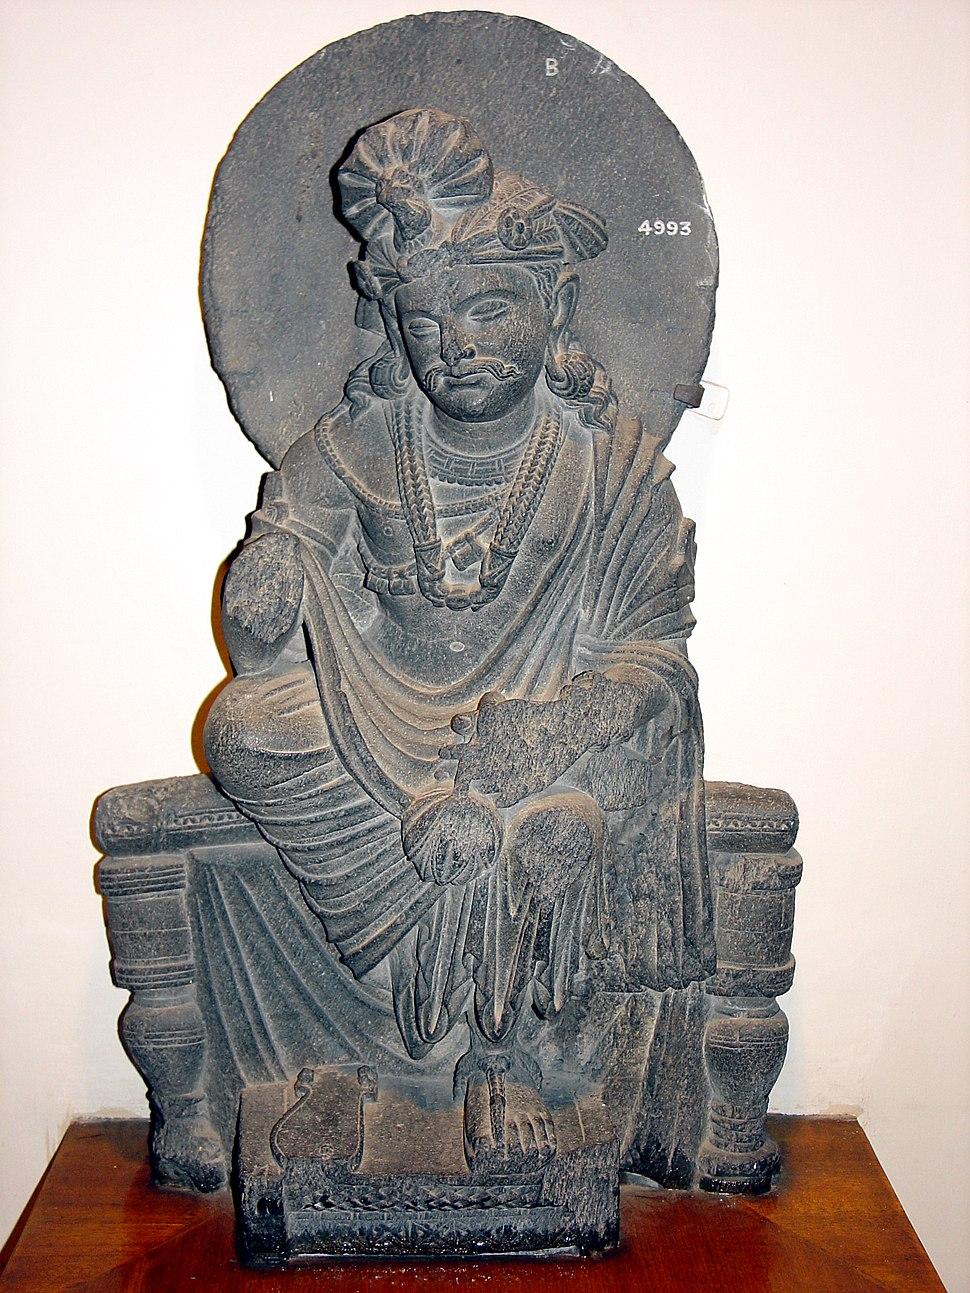 Seated Avalokiteshvara. Gandharan, from Loriyan Tangai. Kushan period, 1st - 3d century AD. Indian Museum, Calcutta ei05-31